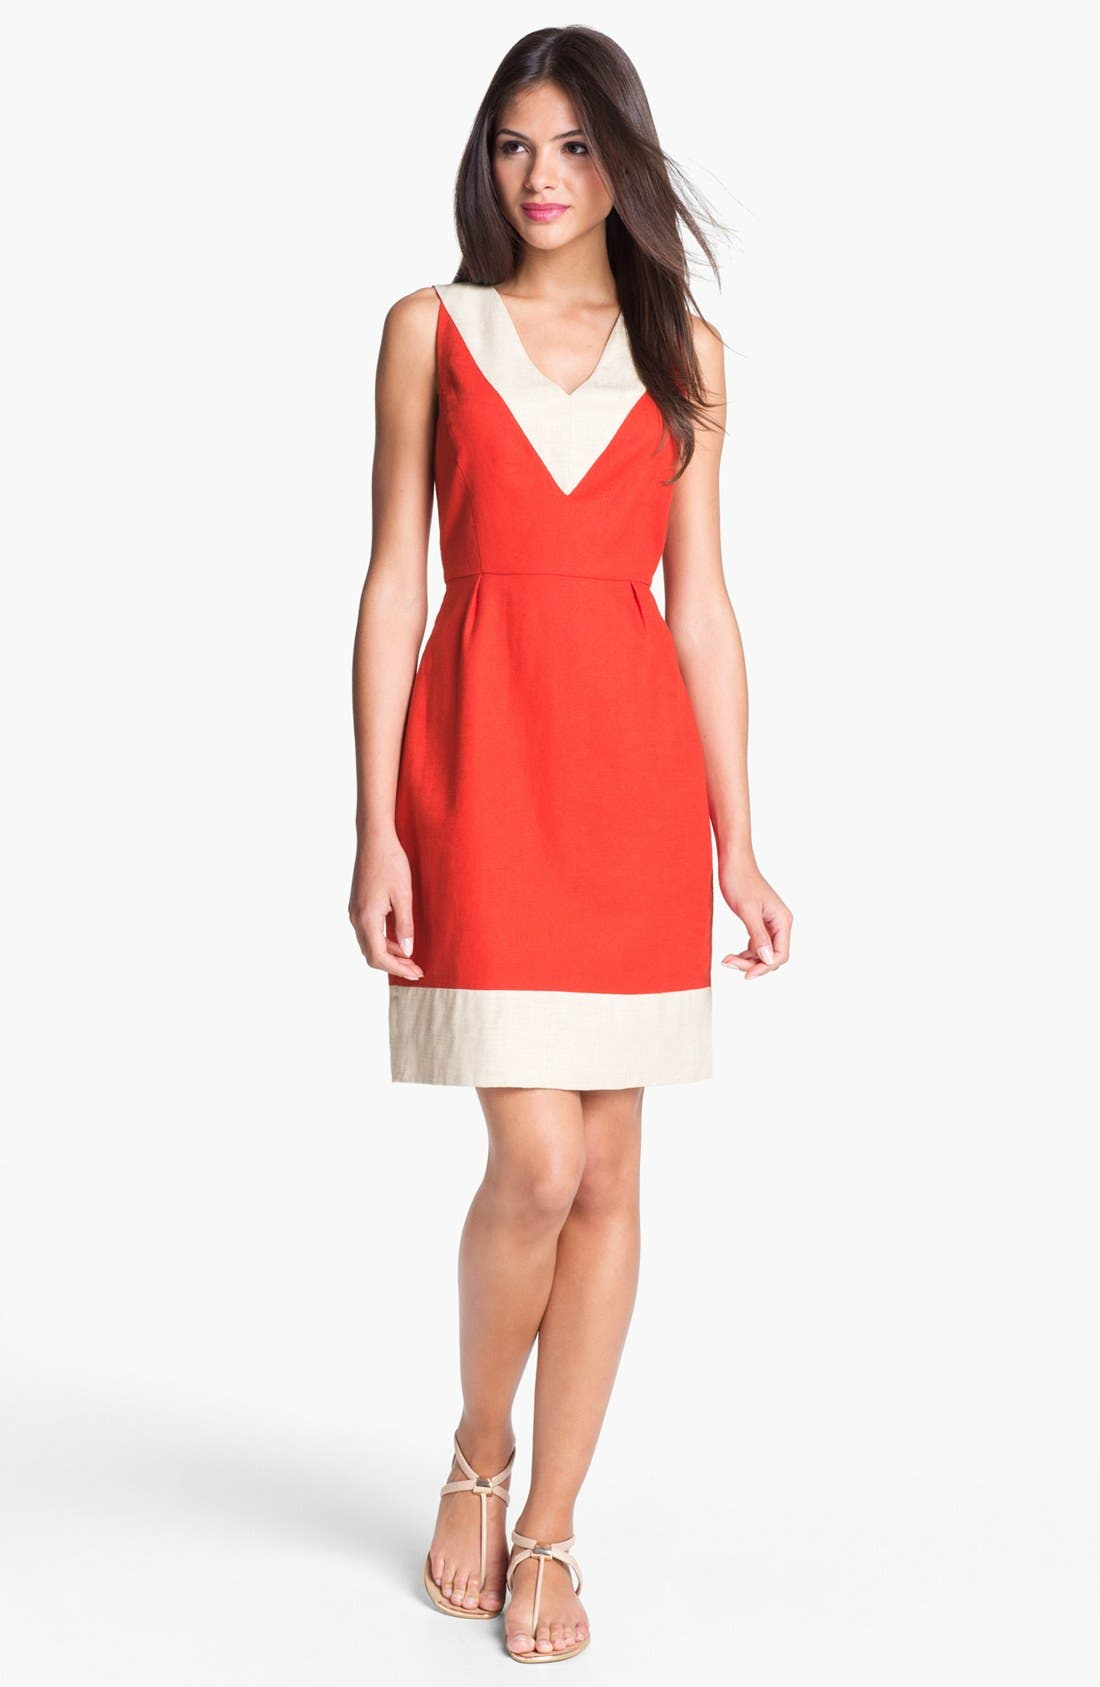 Alternate Image 1 Selected - kate spade new york 'james' cotton blend sheath dress